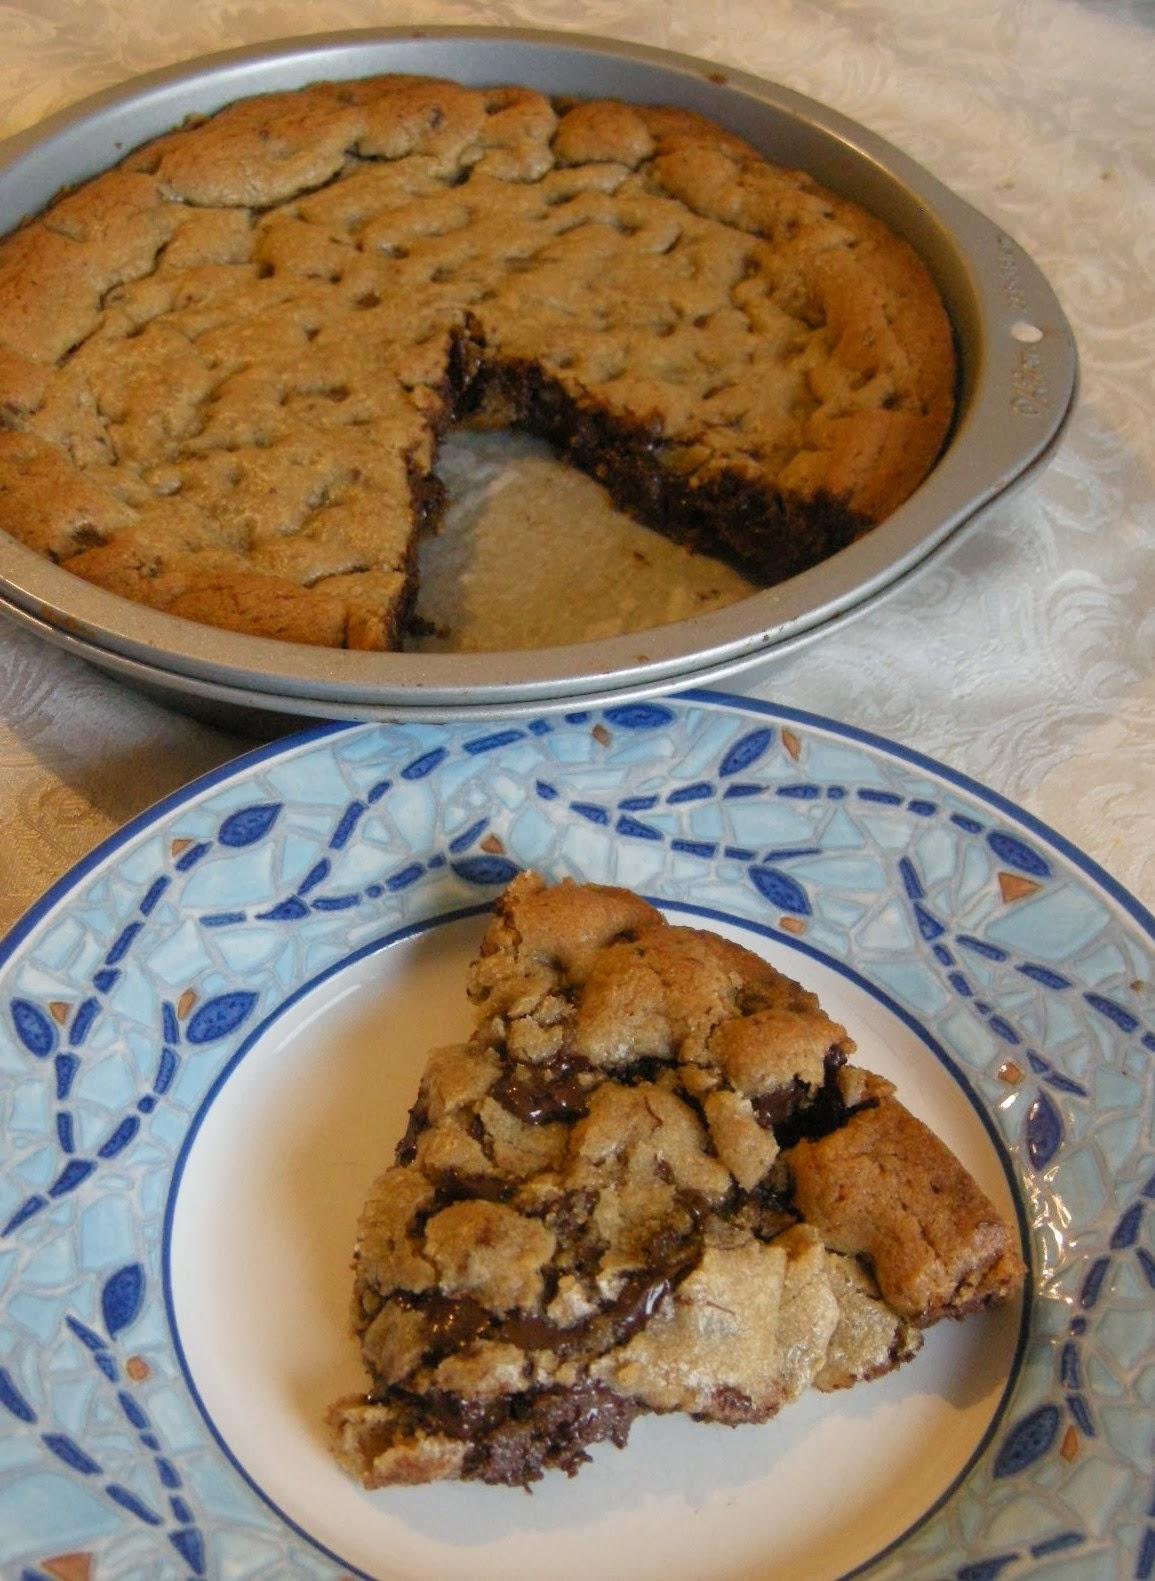 Making Cake Without Cake Flour